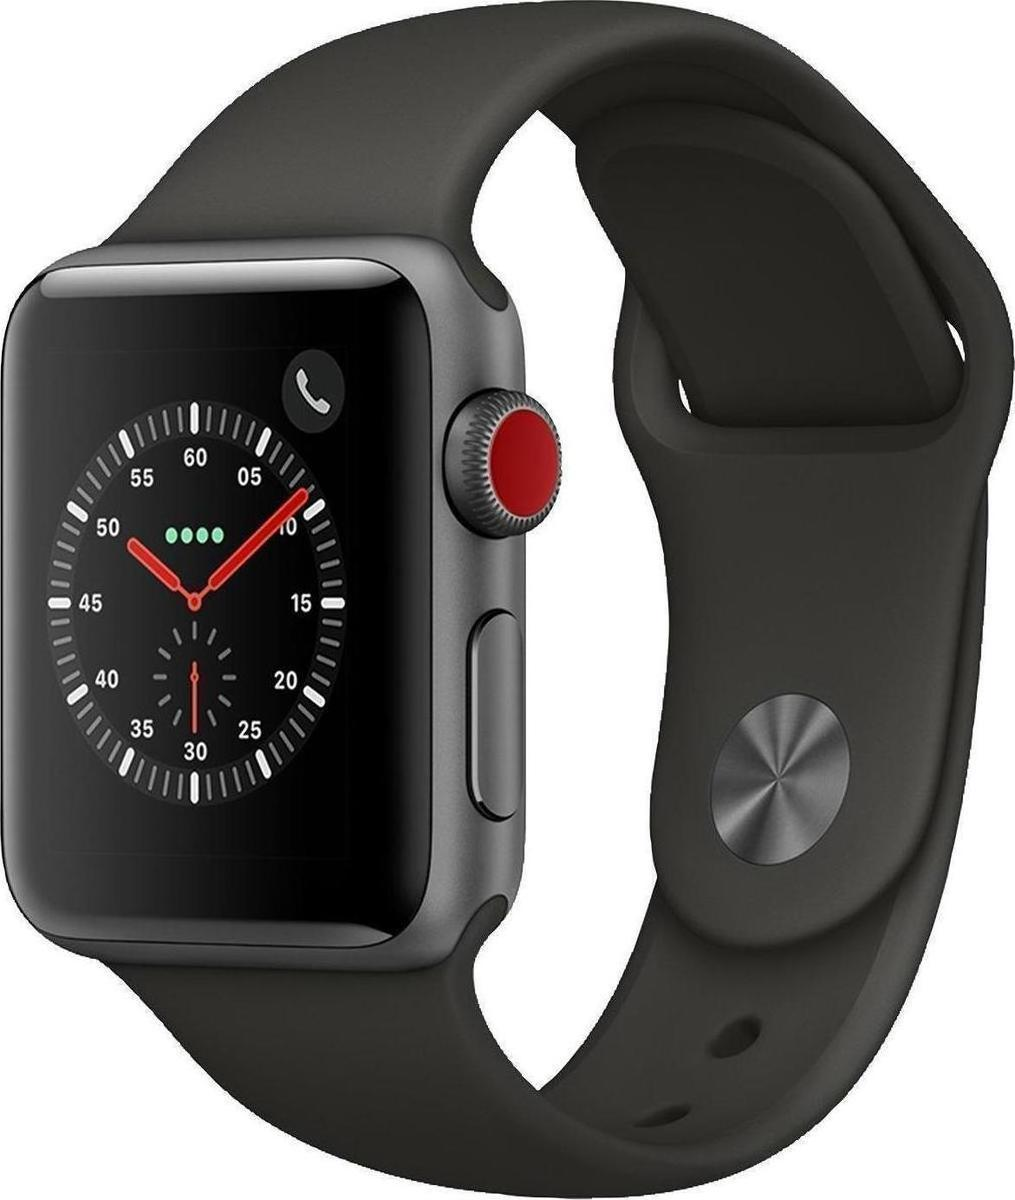 Apple Watch Series 3 Cellular 38mm Grey Aluminium Black Sport Band Πληρωμή έως 24 δόσεις